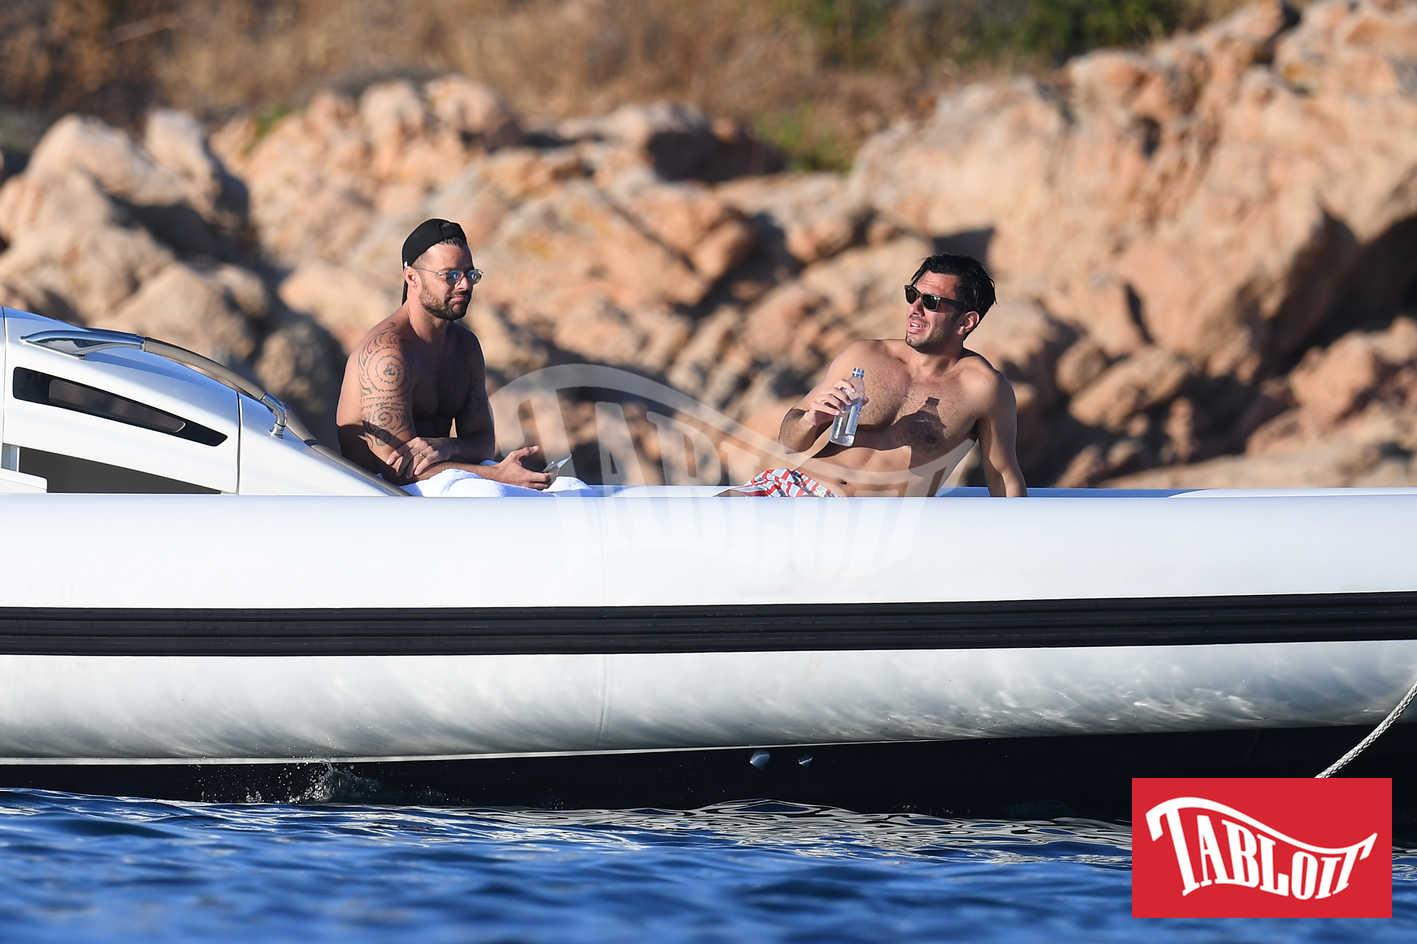 Ricky Martin insieme al Jwan Yosef durante una gita in gommone